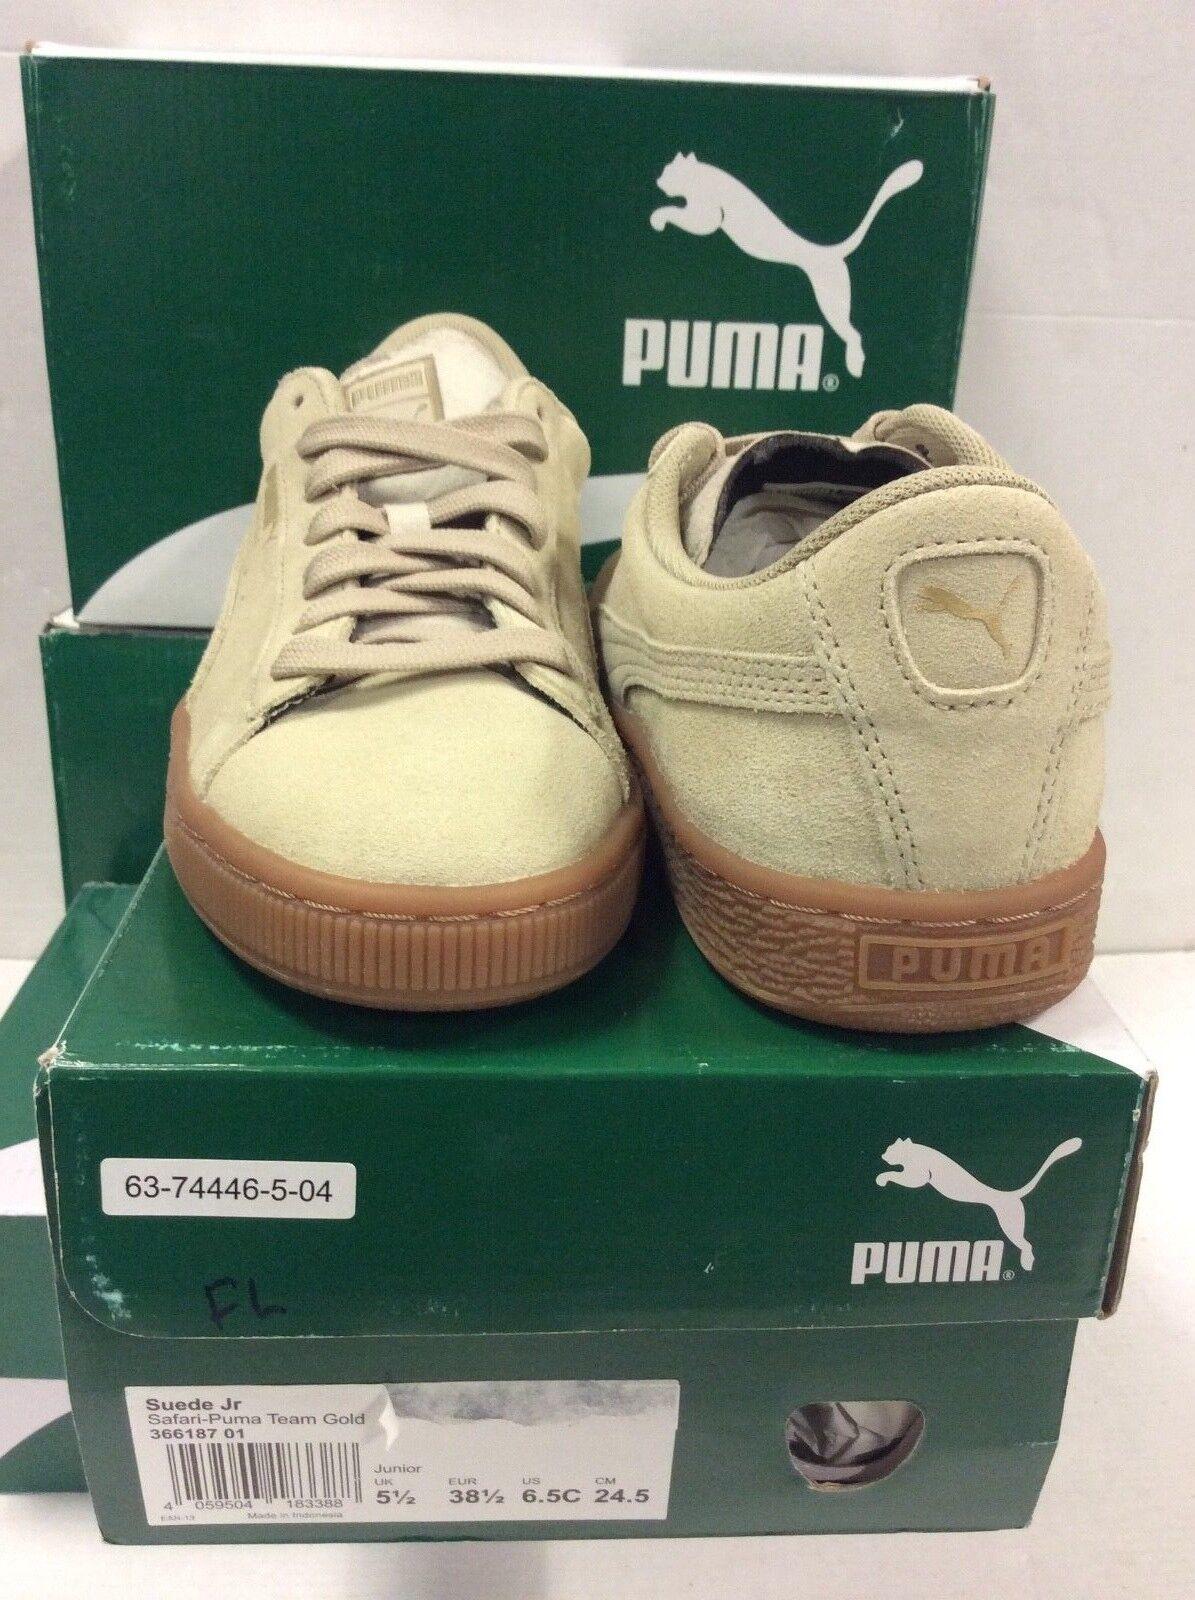 Puma Suede Junior Women's Sneaker Trainers, Size UK 5.5 5.5 5.5   EU 38.5 e0bb30